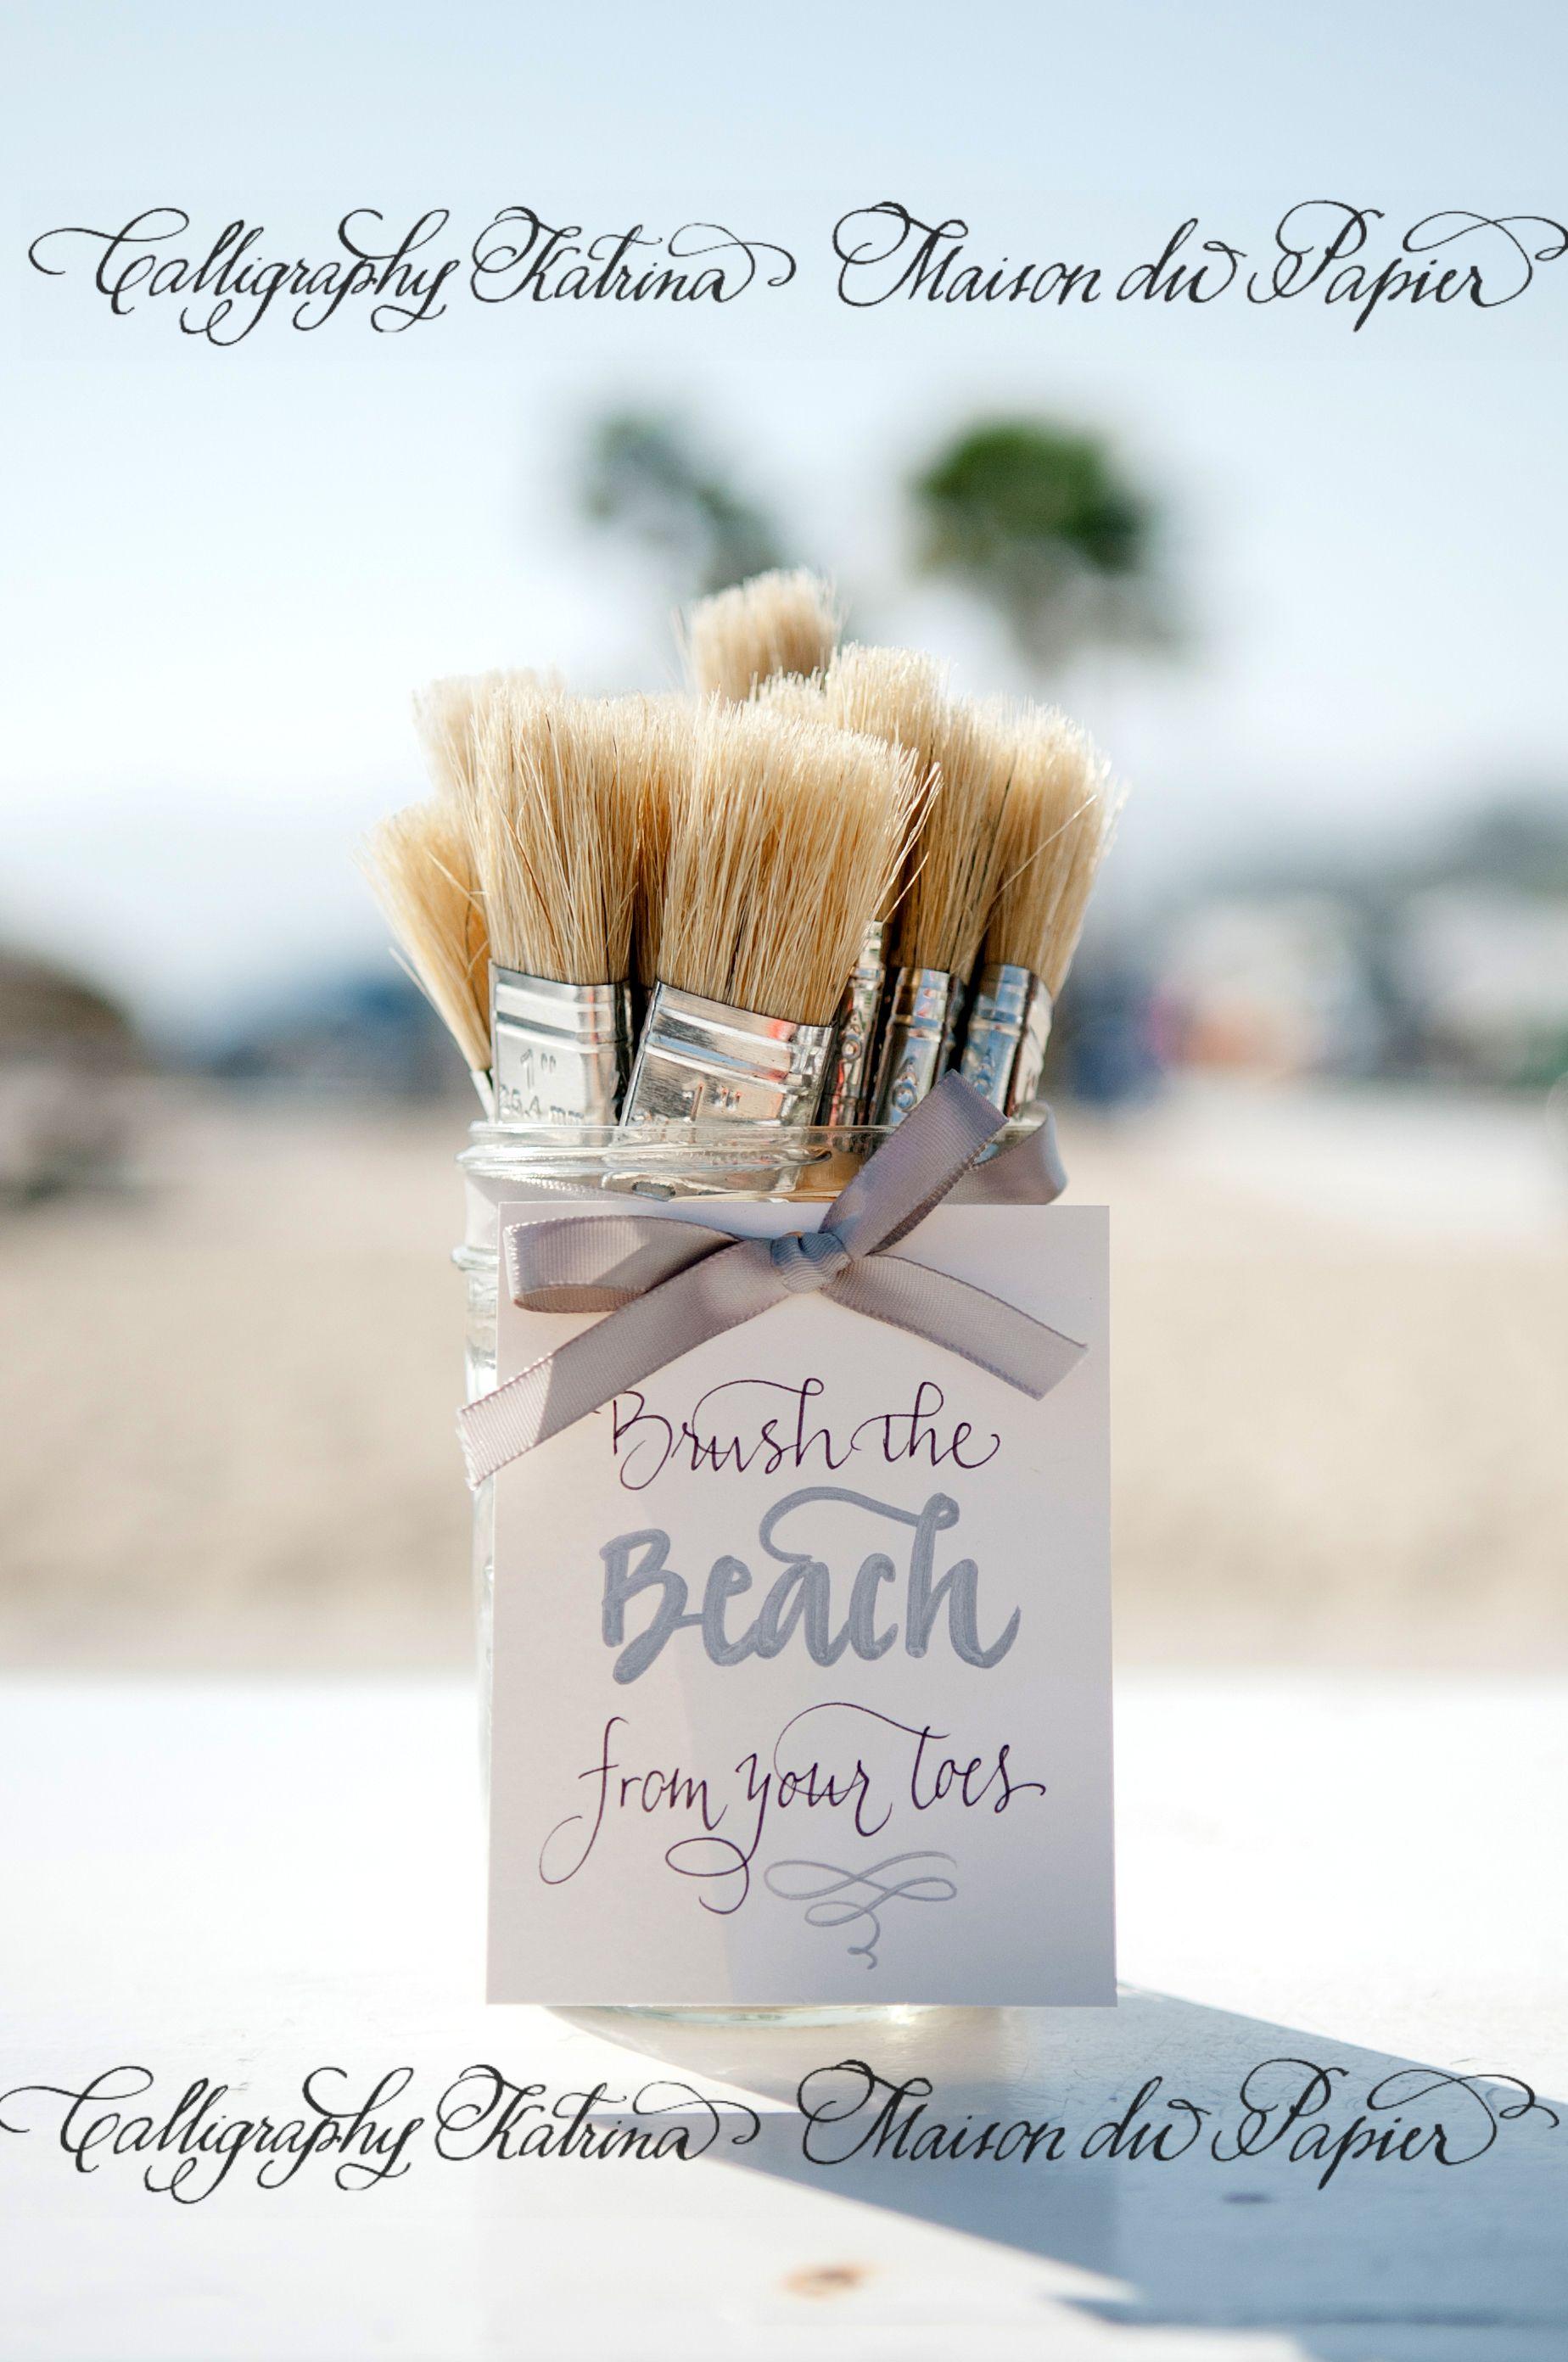 How sweet. I love beach weddings. <3 http://calligraphykatrina.com ...